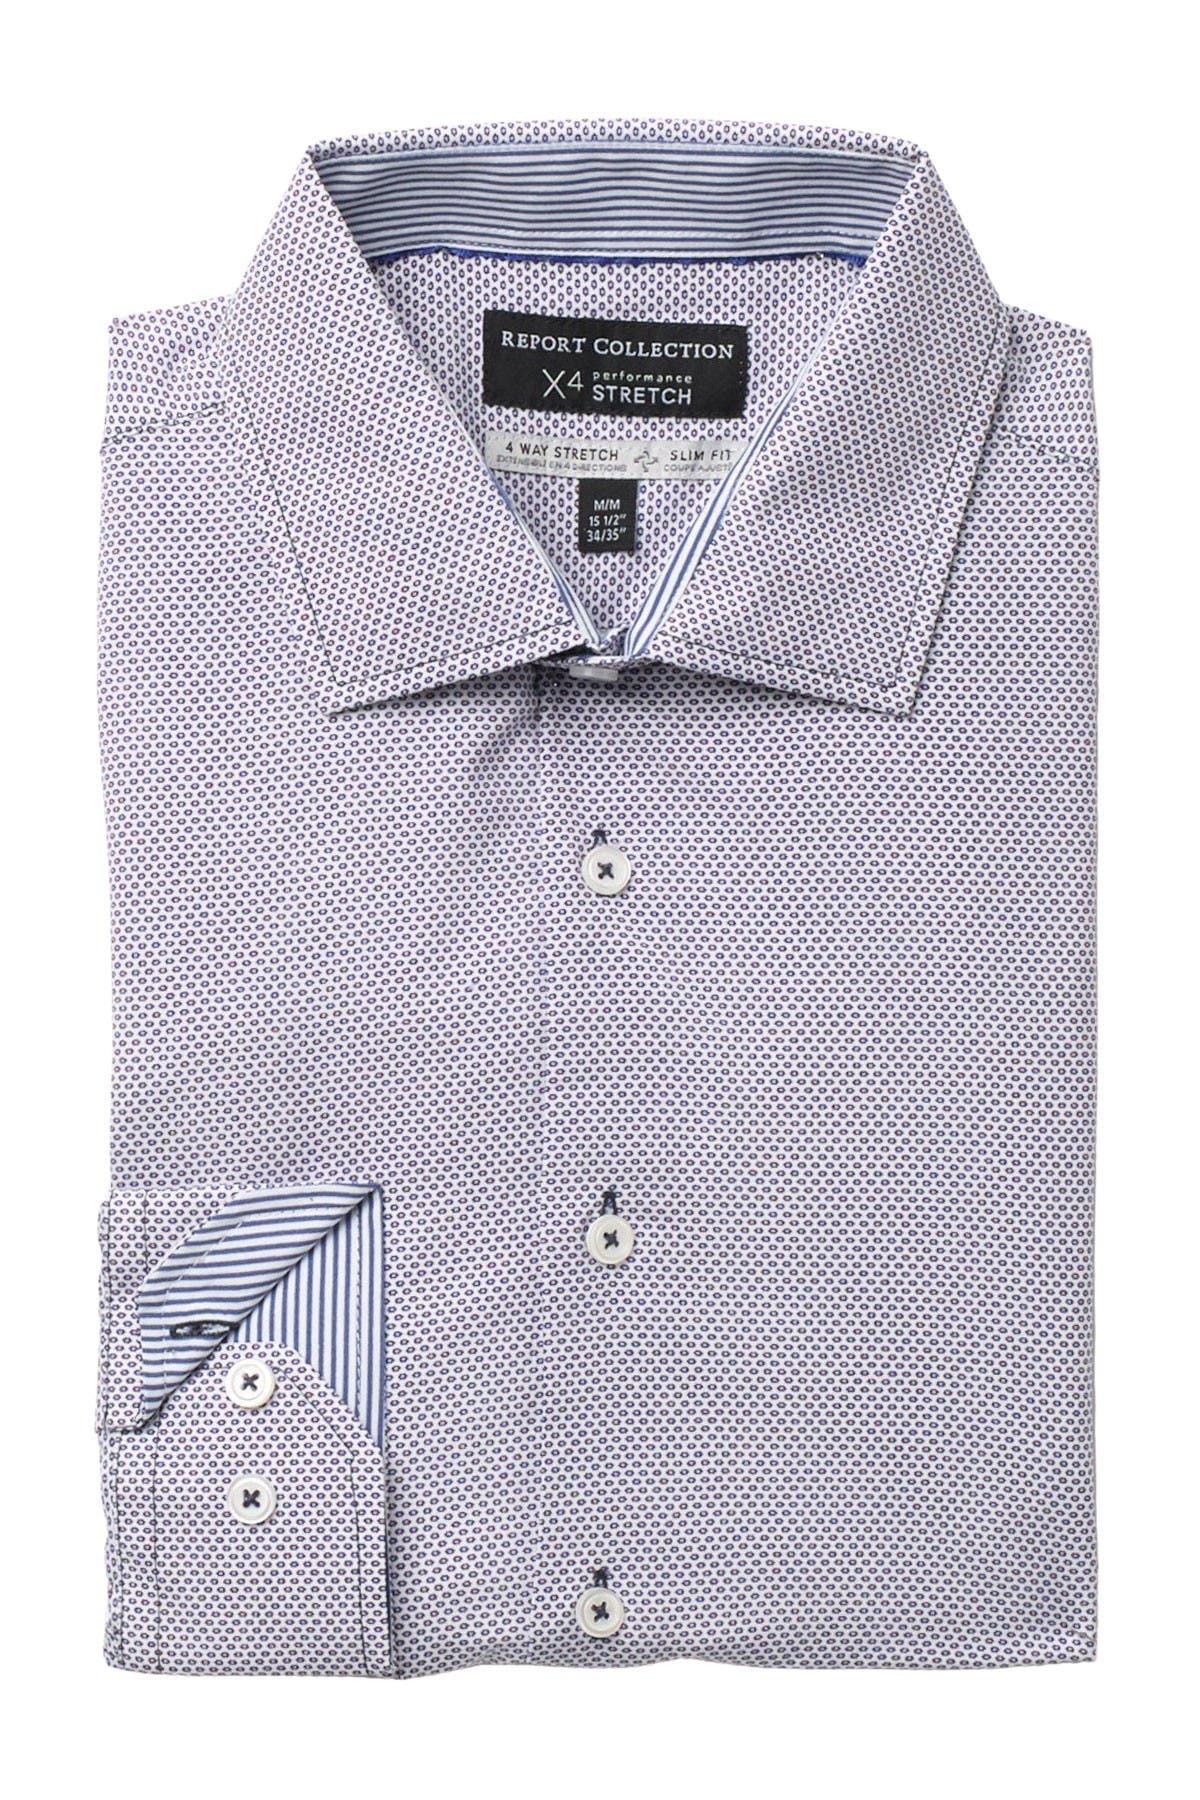 Report Collection Mini Motif Print 4 Way Stretch Slim Fit Dress Shirt